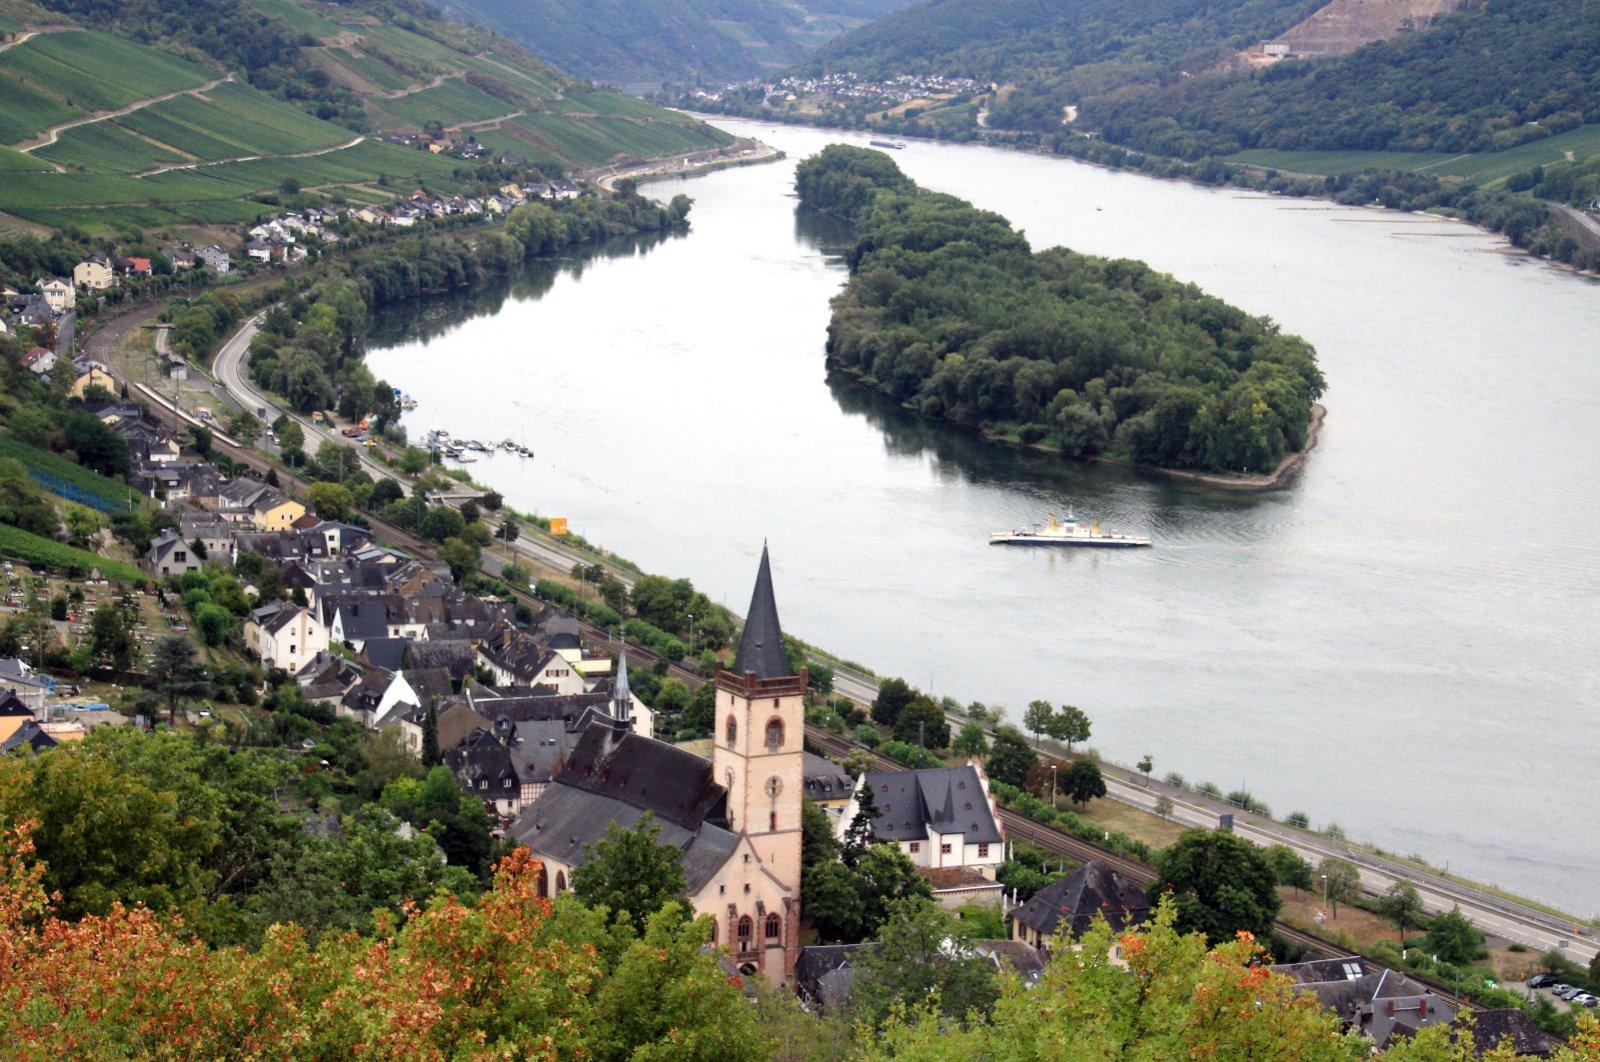 From the Rhein-Wisper-Glück circular trail, the view falls on Lorch am Rhein. (DPA Photo)